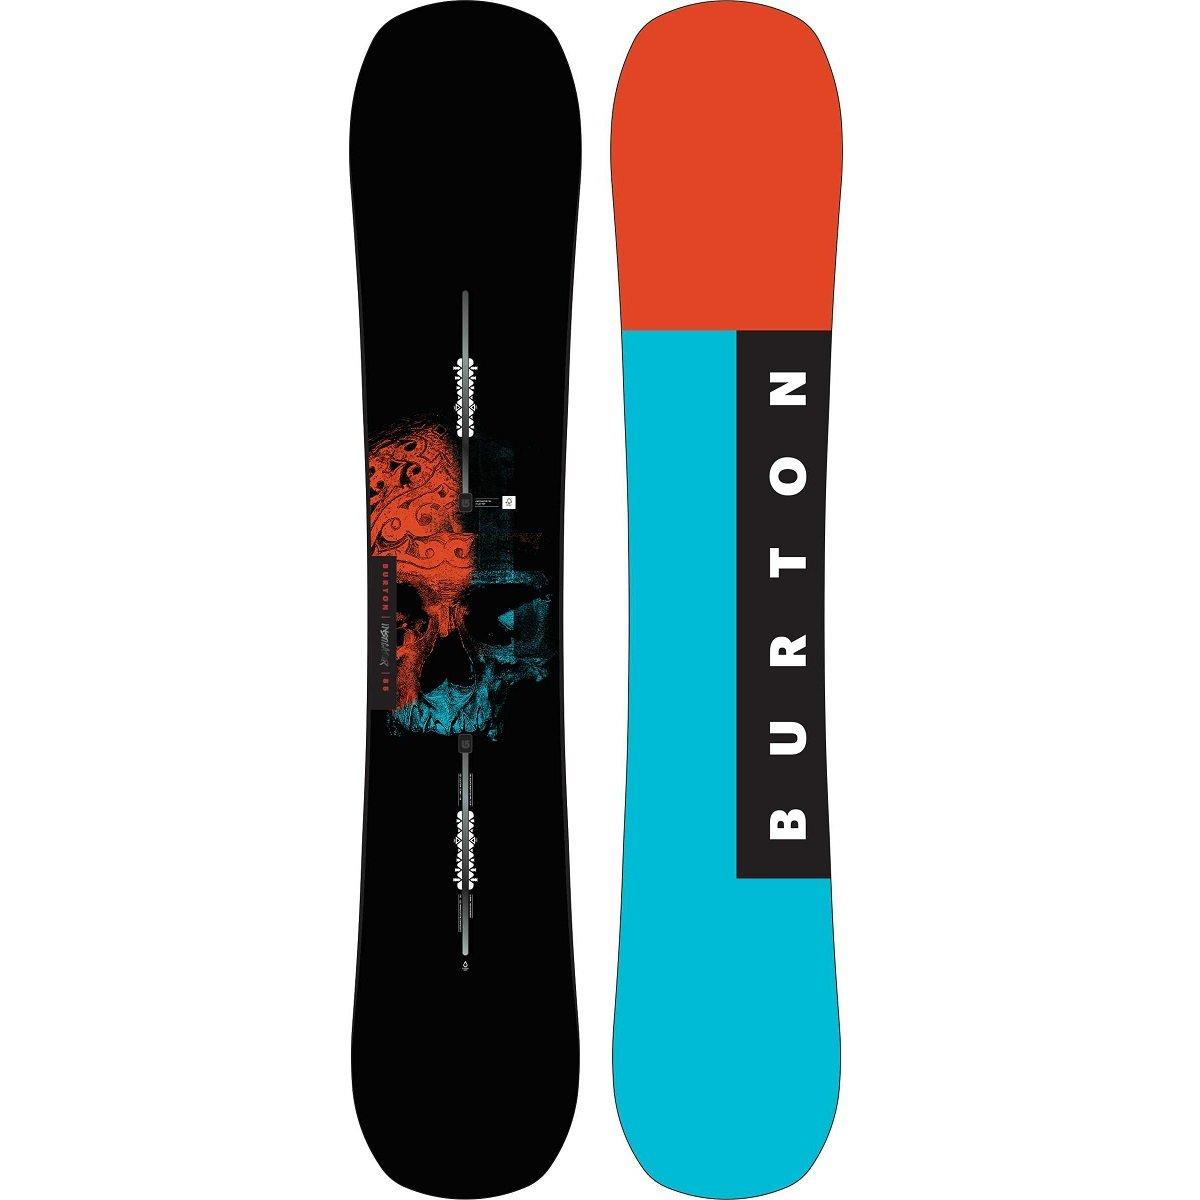 купить сноуборд бертон